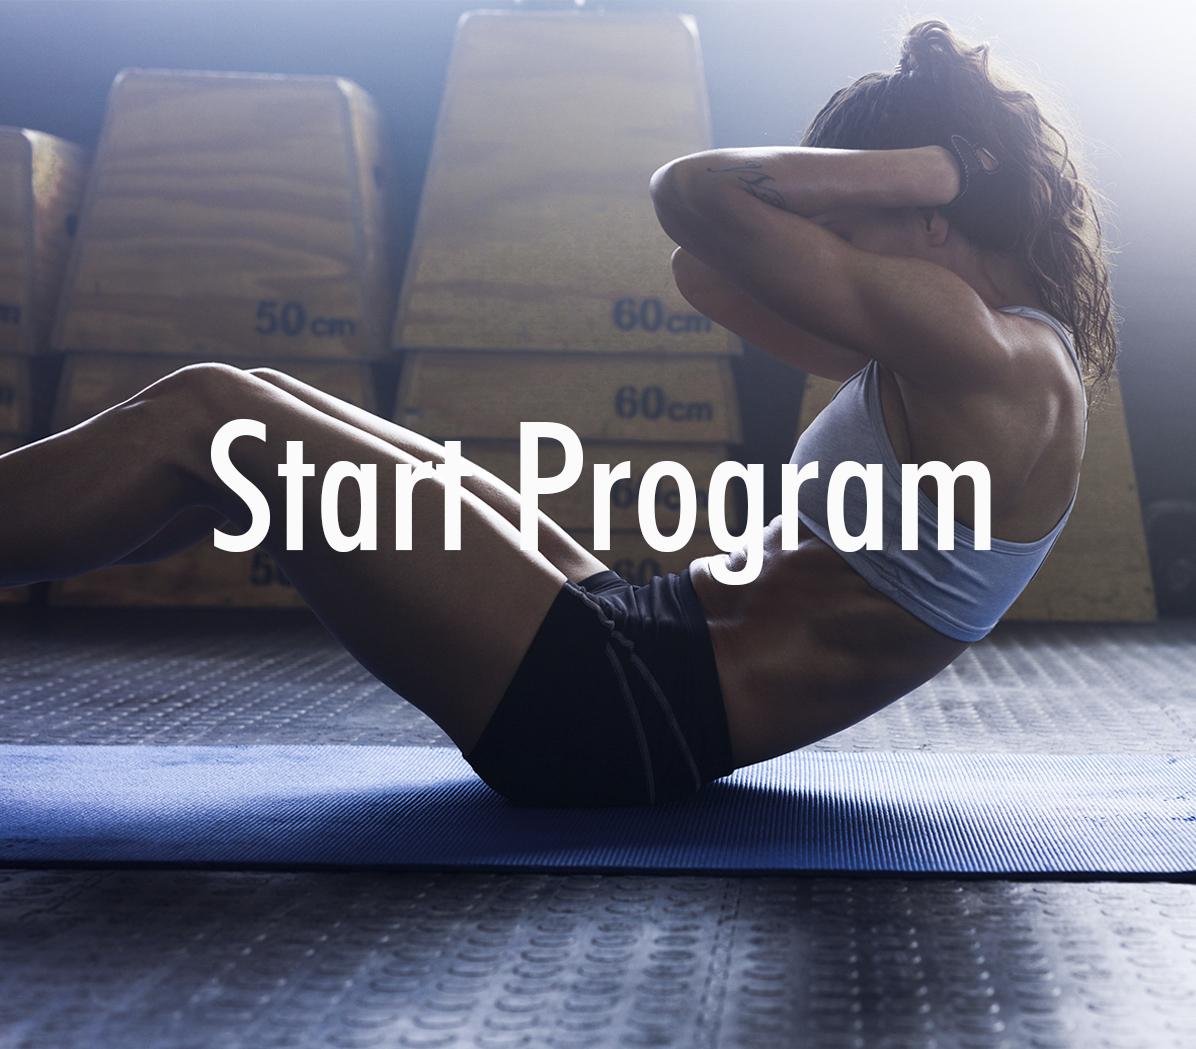 Start Program QWellness Club de Fitness gimnasio Sabadell